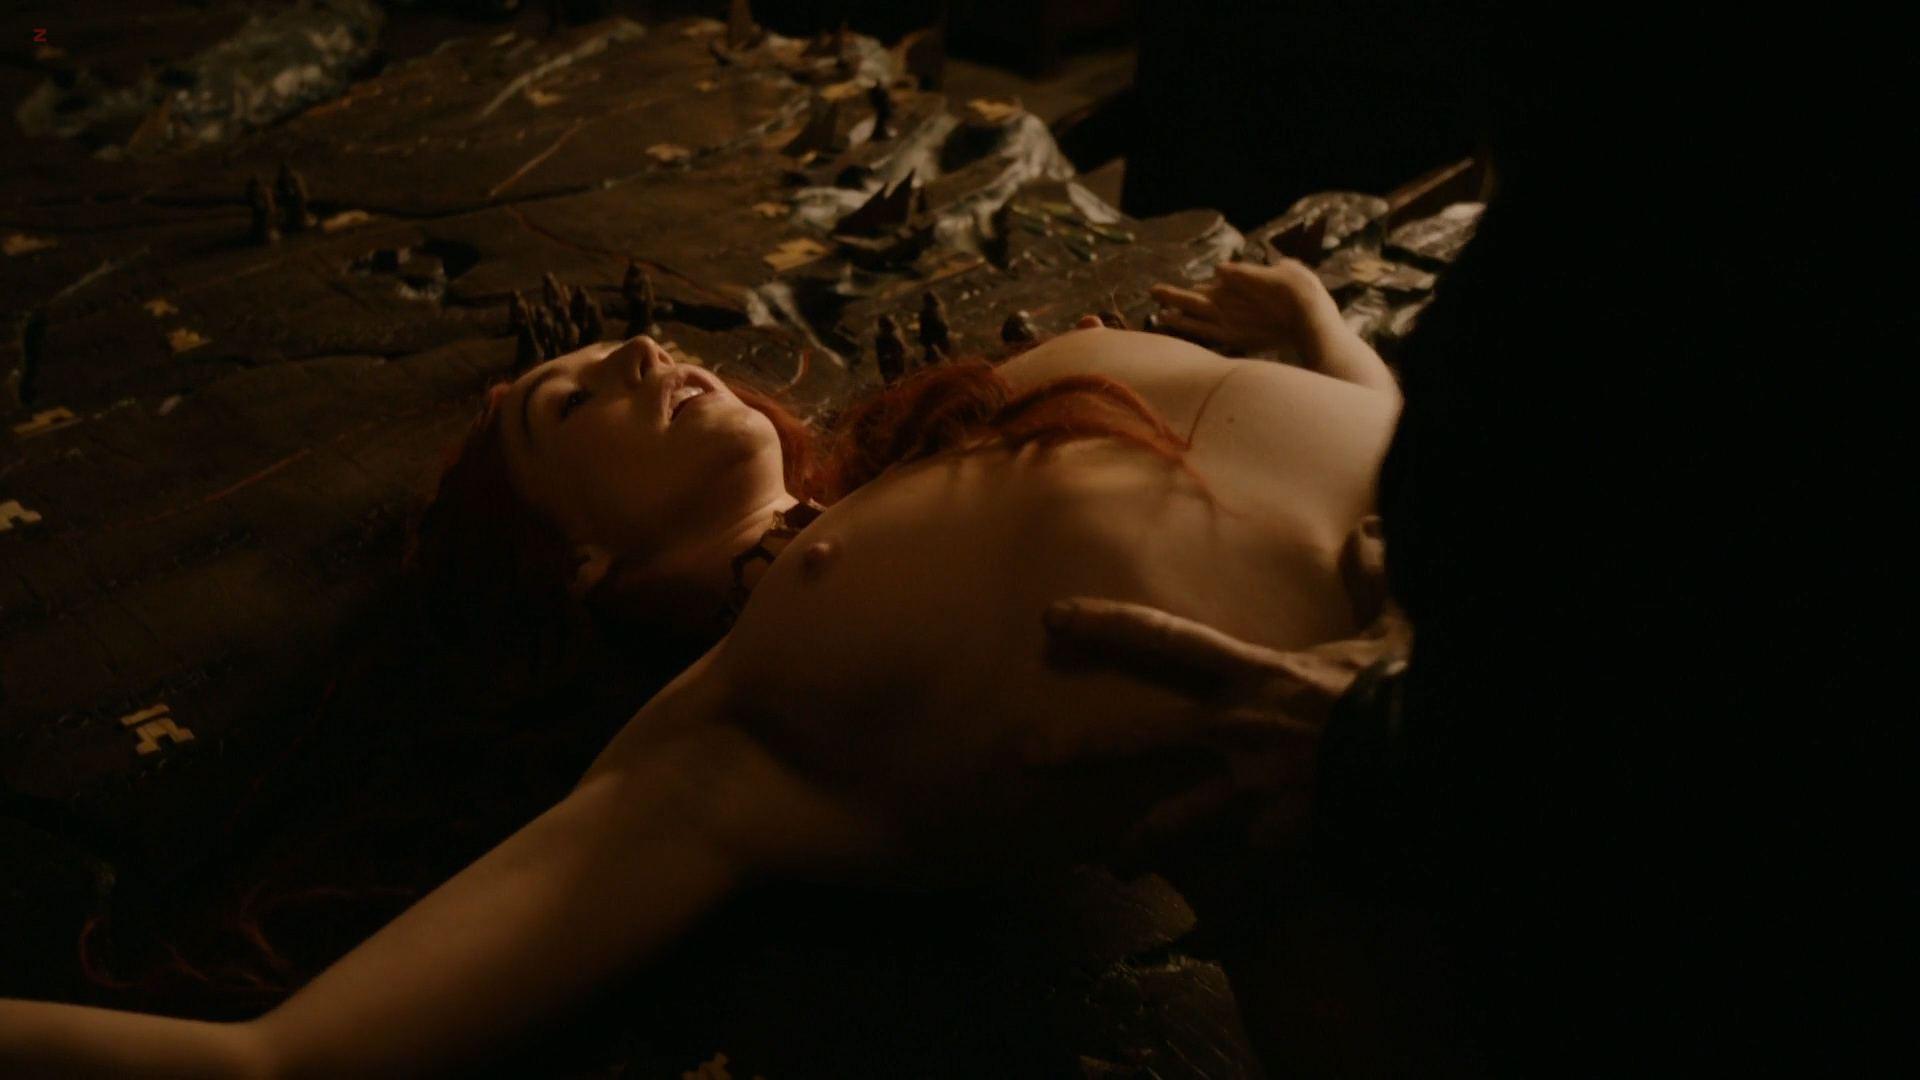 0313175853666_10_Carice-van-Houten-nude-bush-Sahara-Knite-and-Amy-Dawson-nude-sex-Game-Of-Thrones-2012-s2e2-HD-1080p-000.jpg